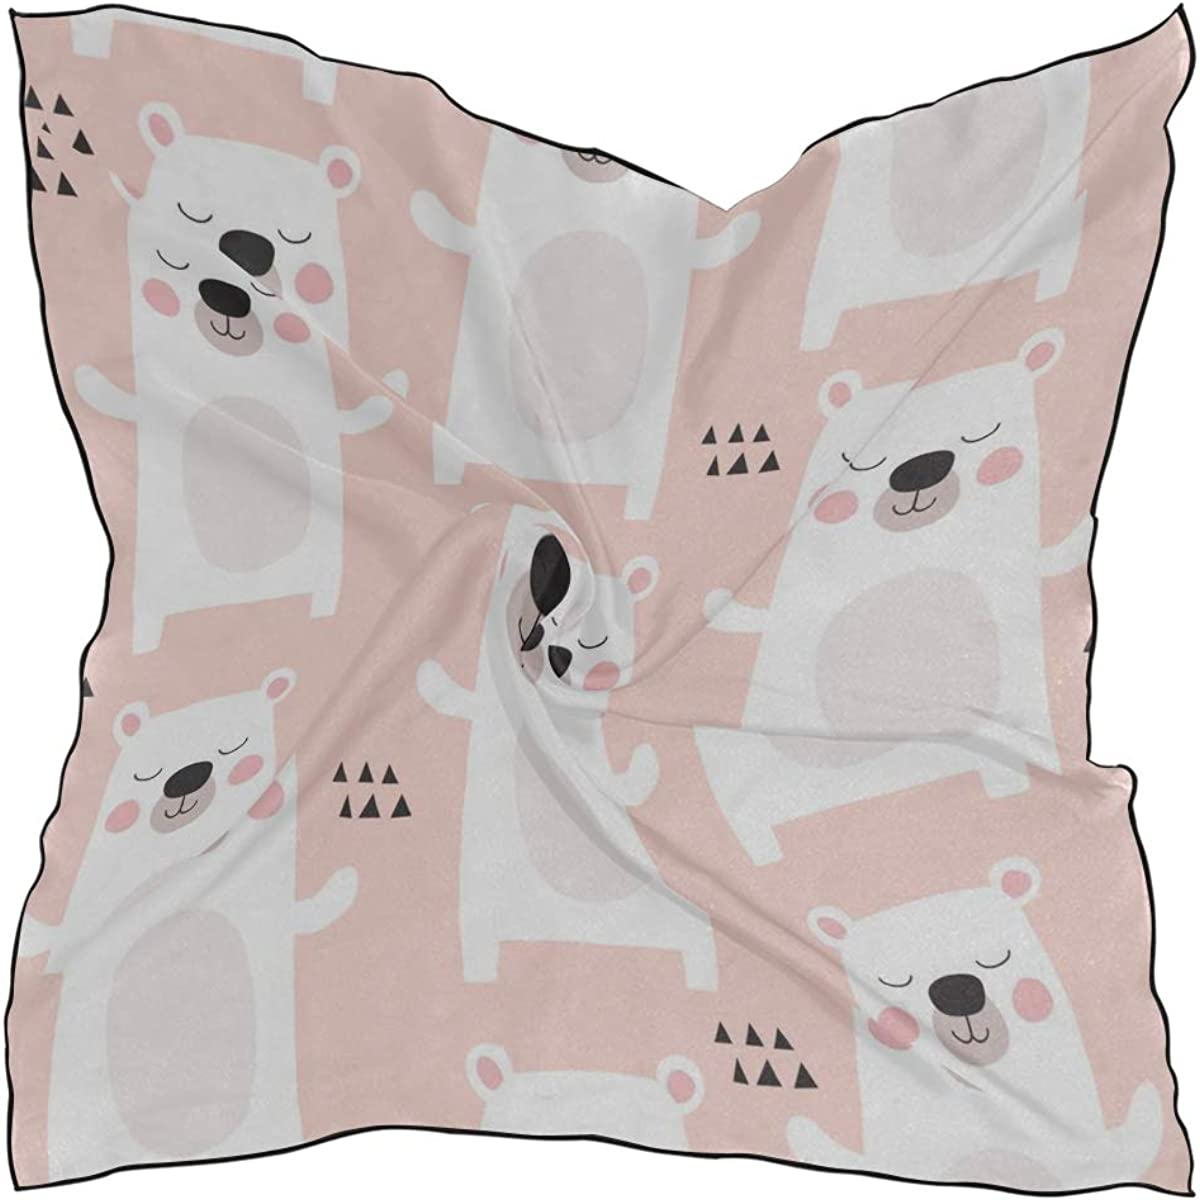 Soft Polyester Silk Ladies Scarves Fashion Print Cute Big Polar Bear Hand Drawn Women Neck Scarf Ladies Scarf Girl Scarves Multiple Ways Of Wearing Daily Decor